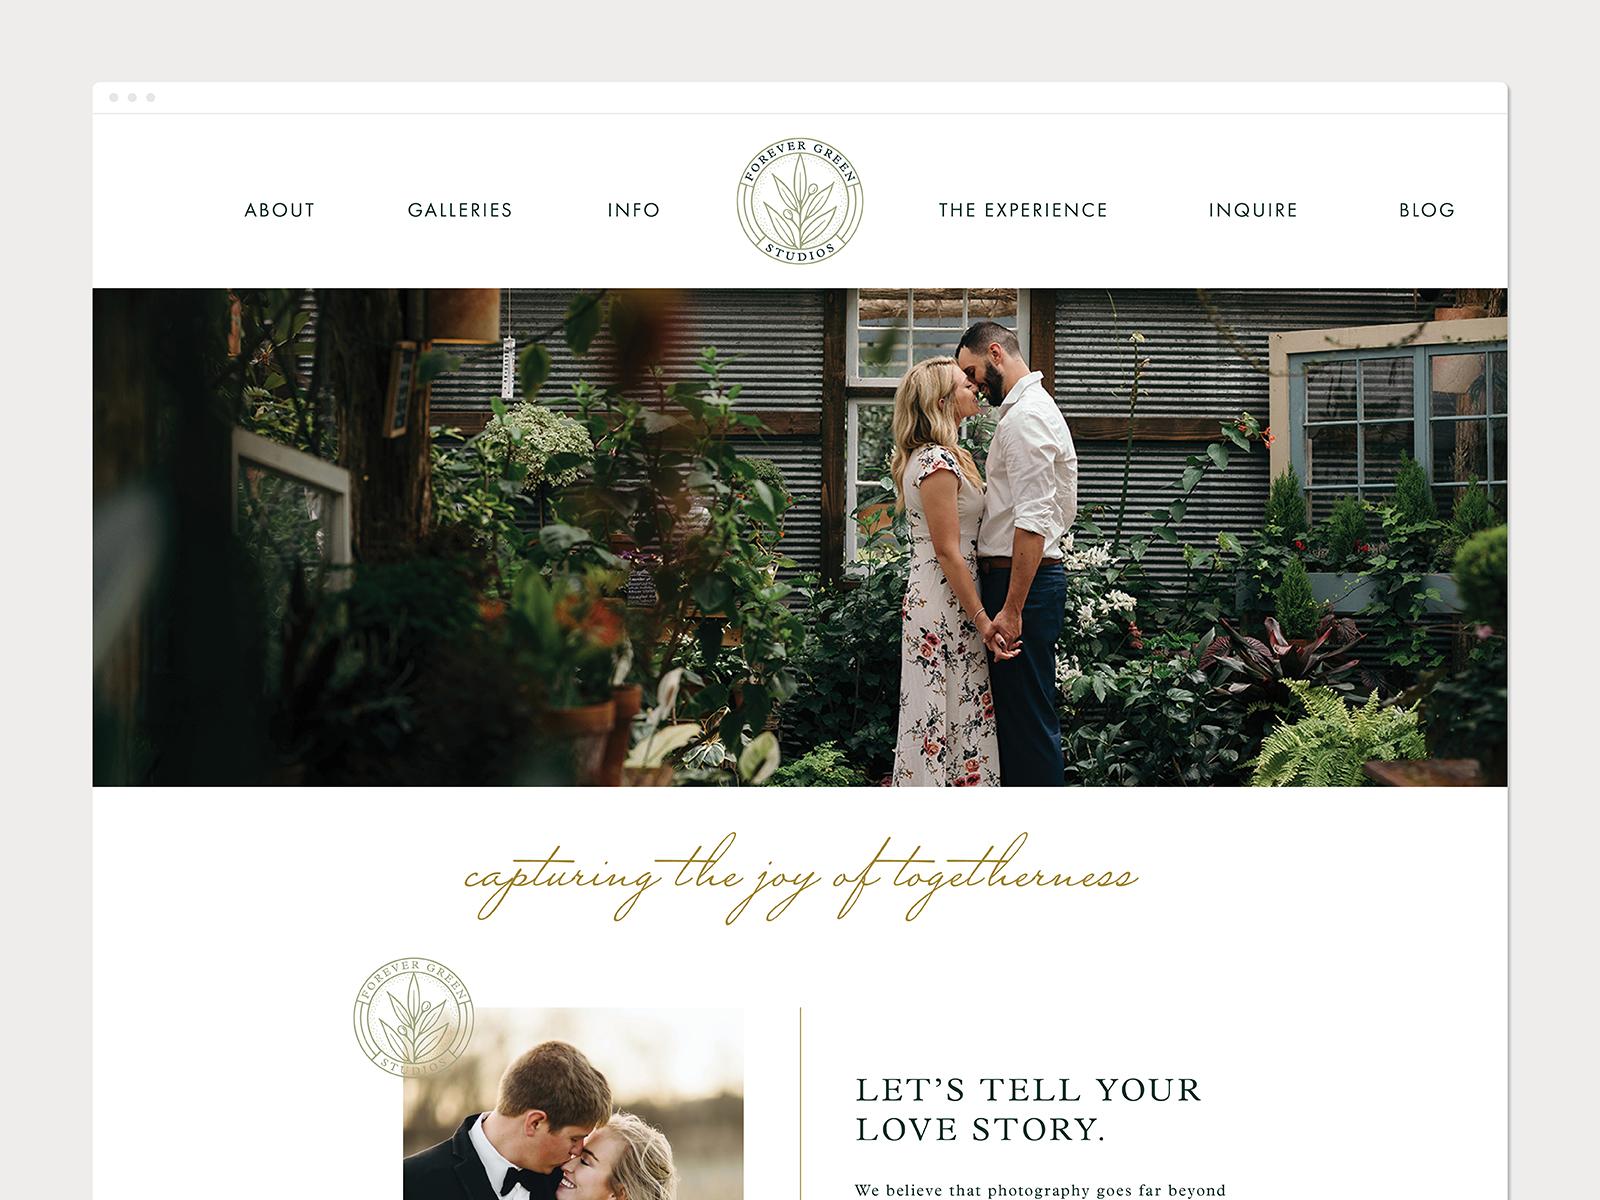 Cedar Rapids Iowa wedding photography website design